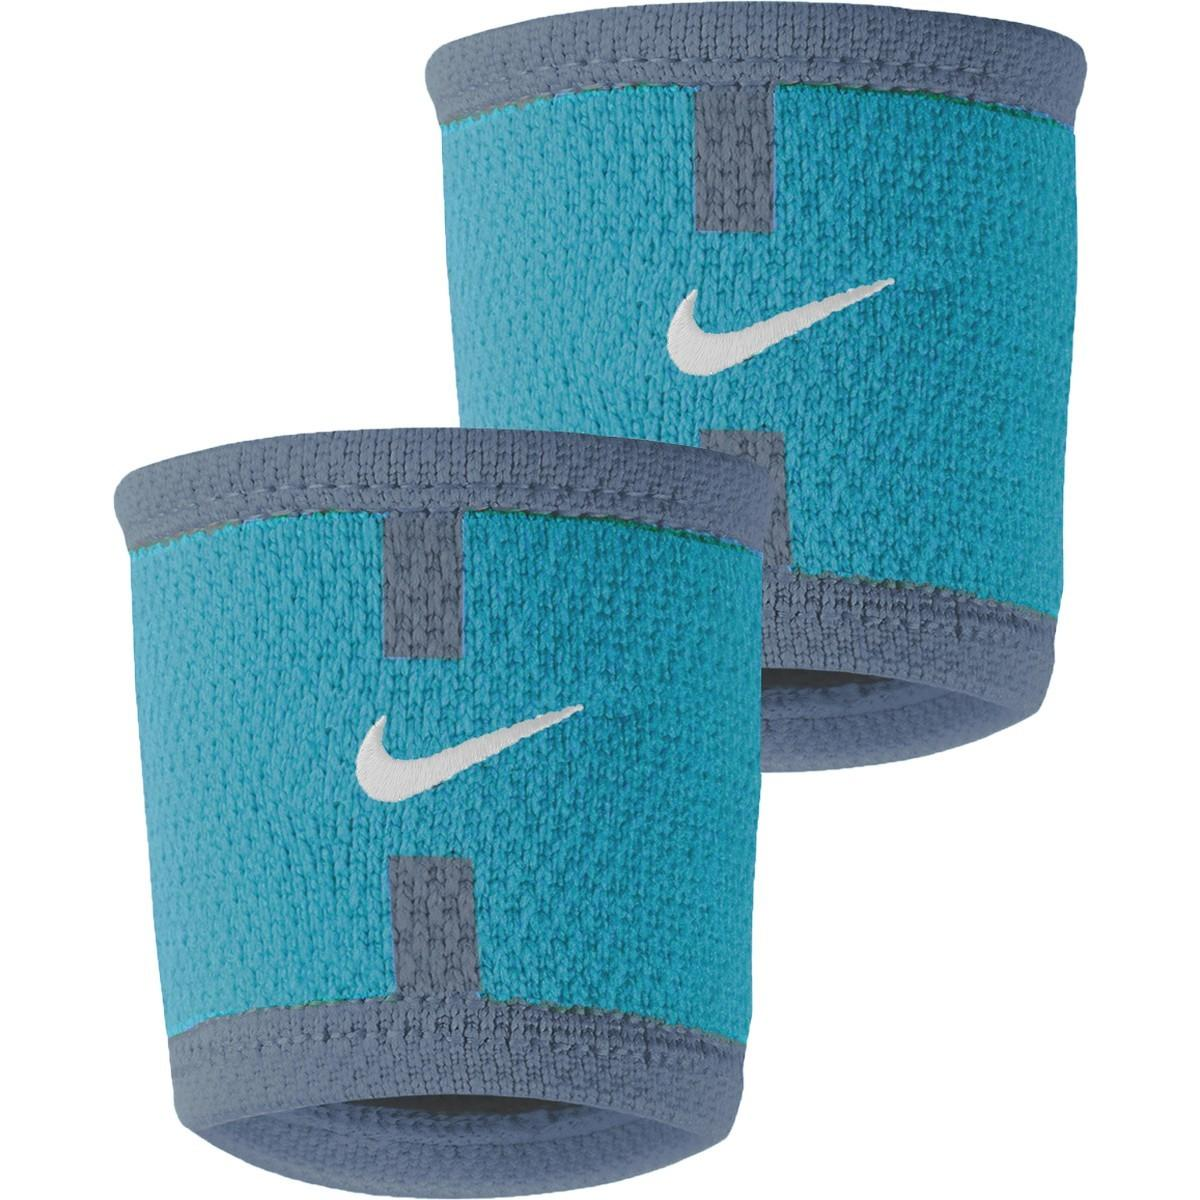 Напульсник Nike Court Victoria Azarenka Paris Wristbands blue/turquoise